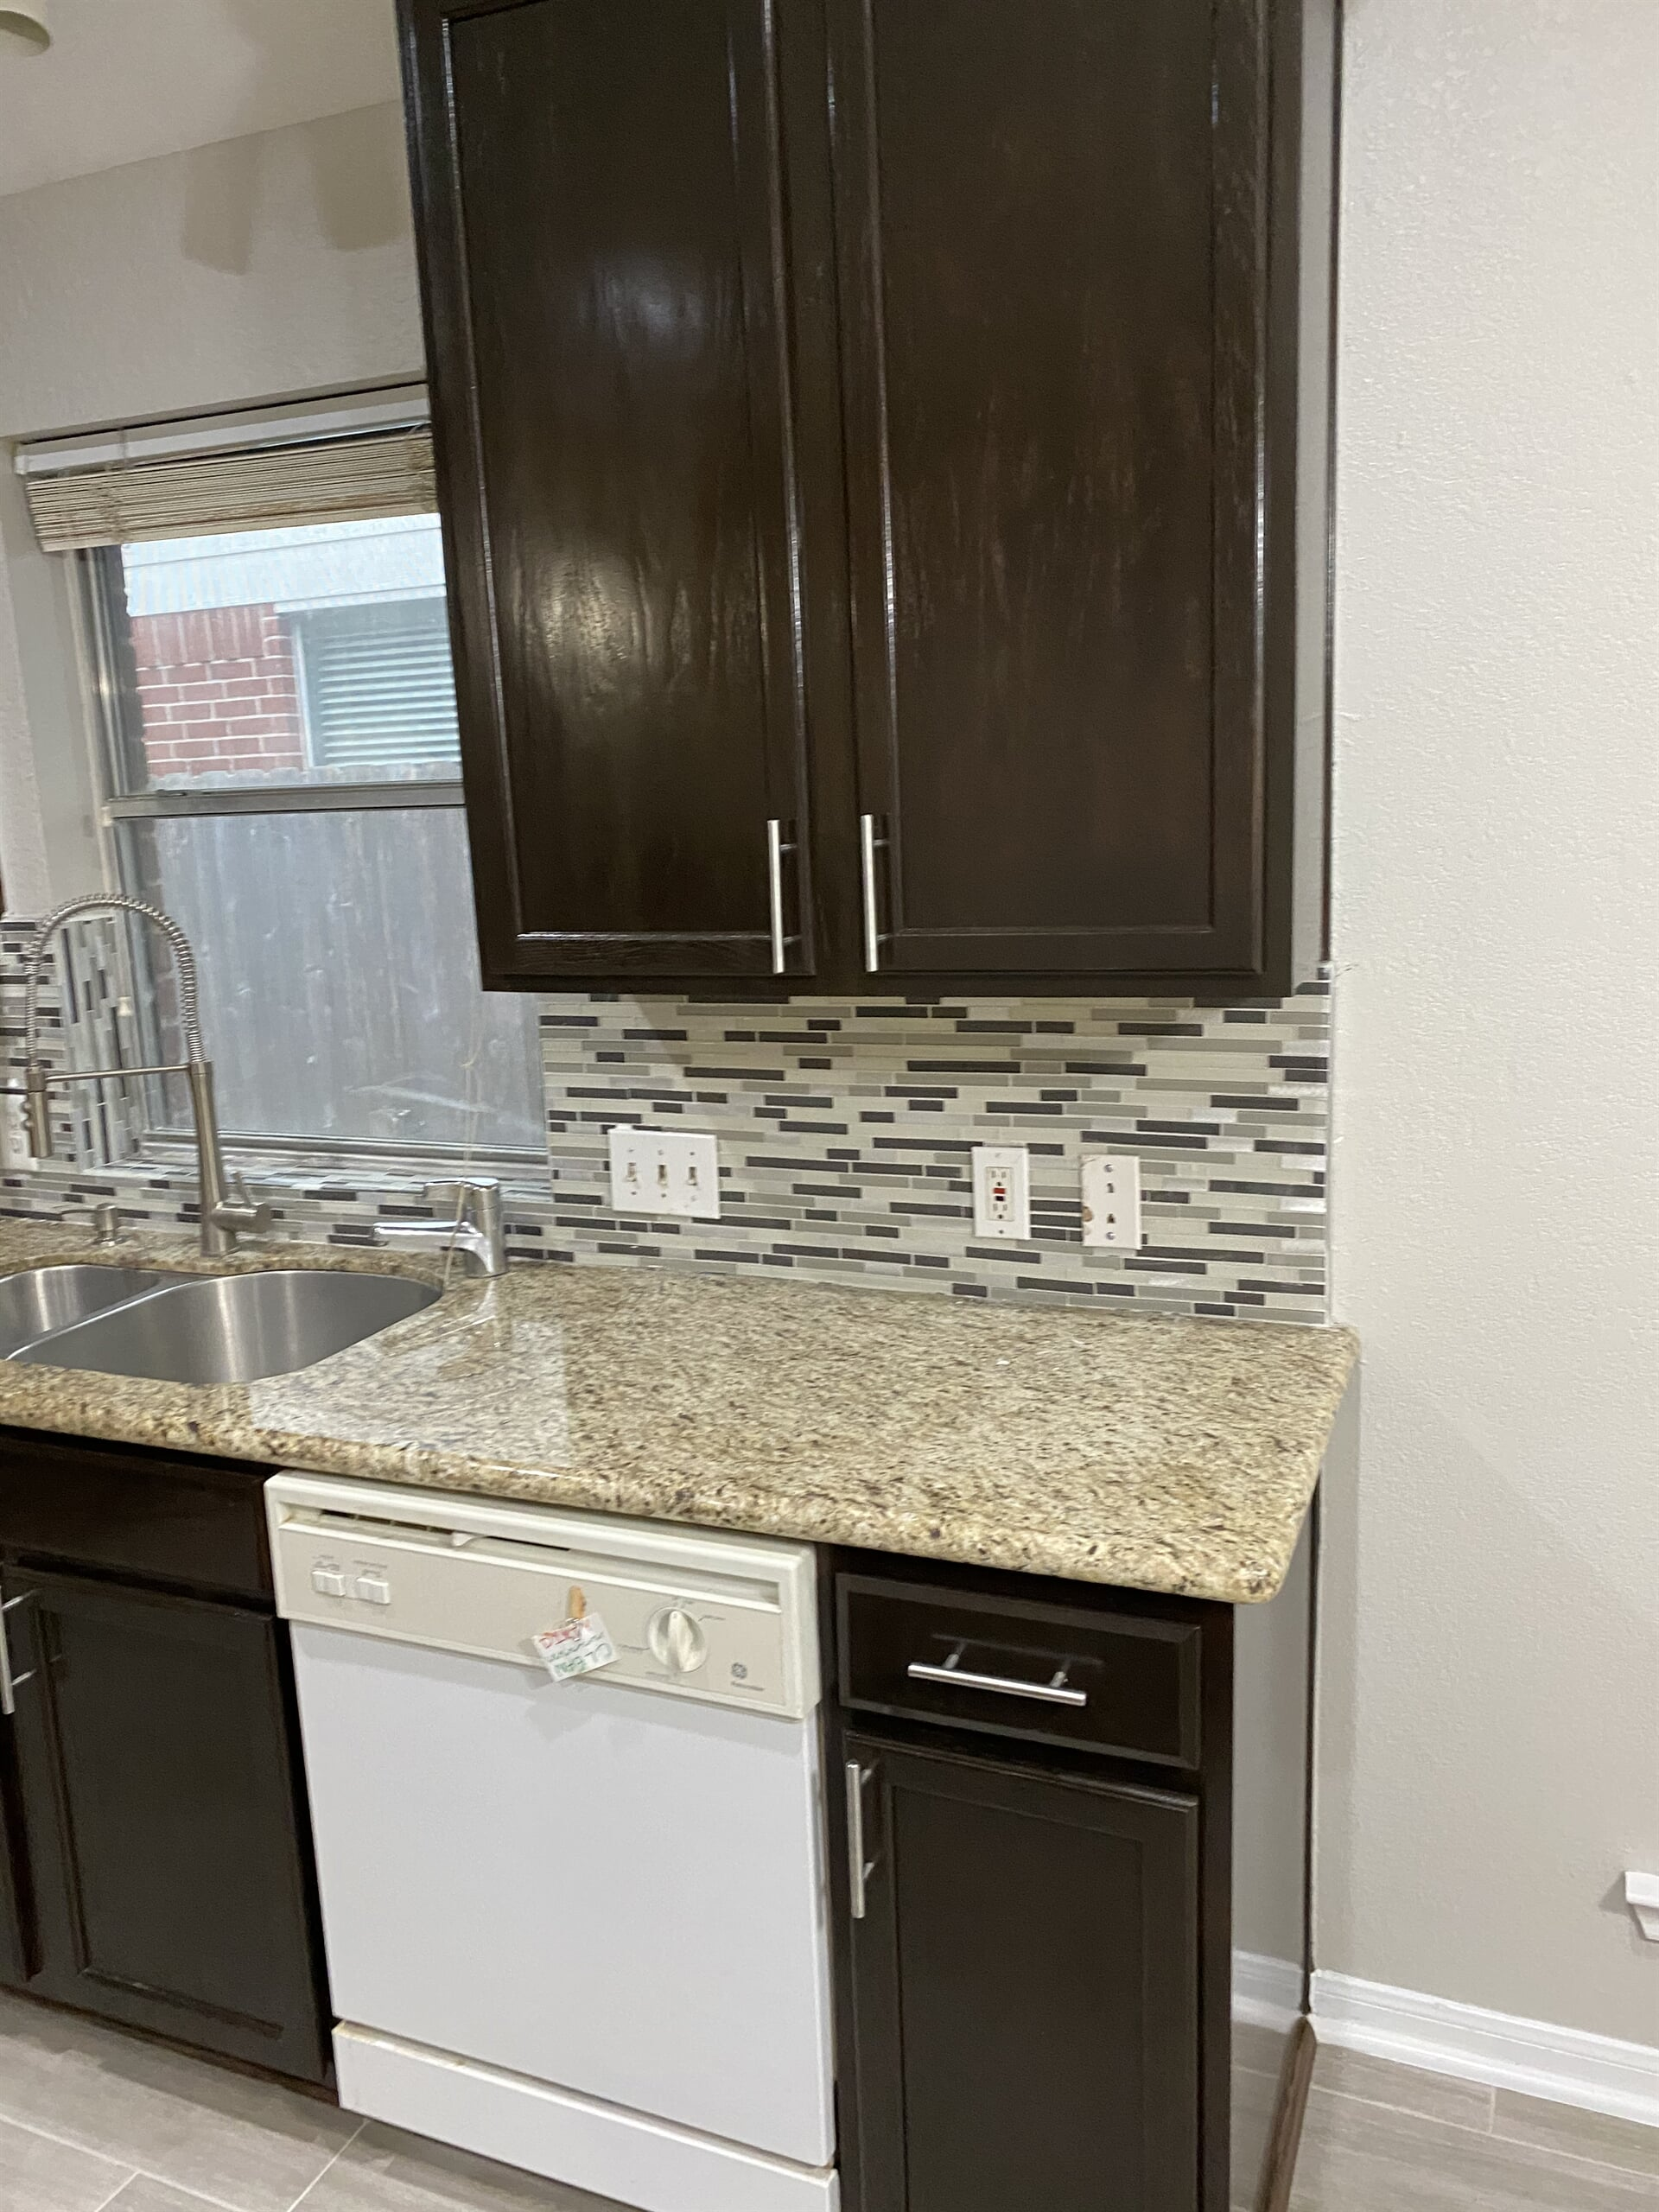 Kitchen Cabinets from Houston Floor Installation Services in Houston, TX